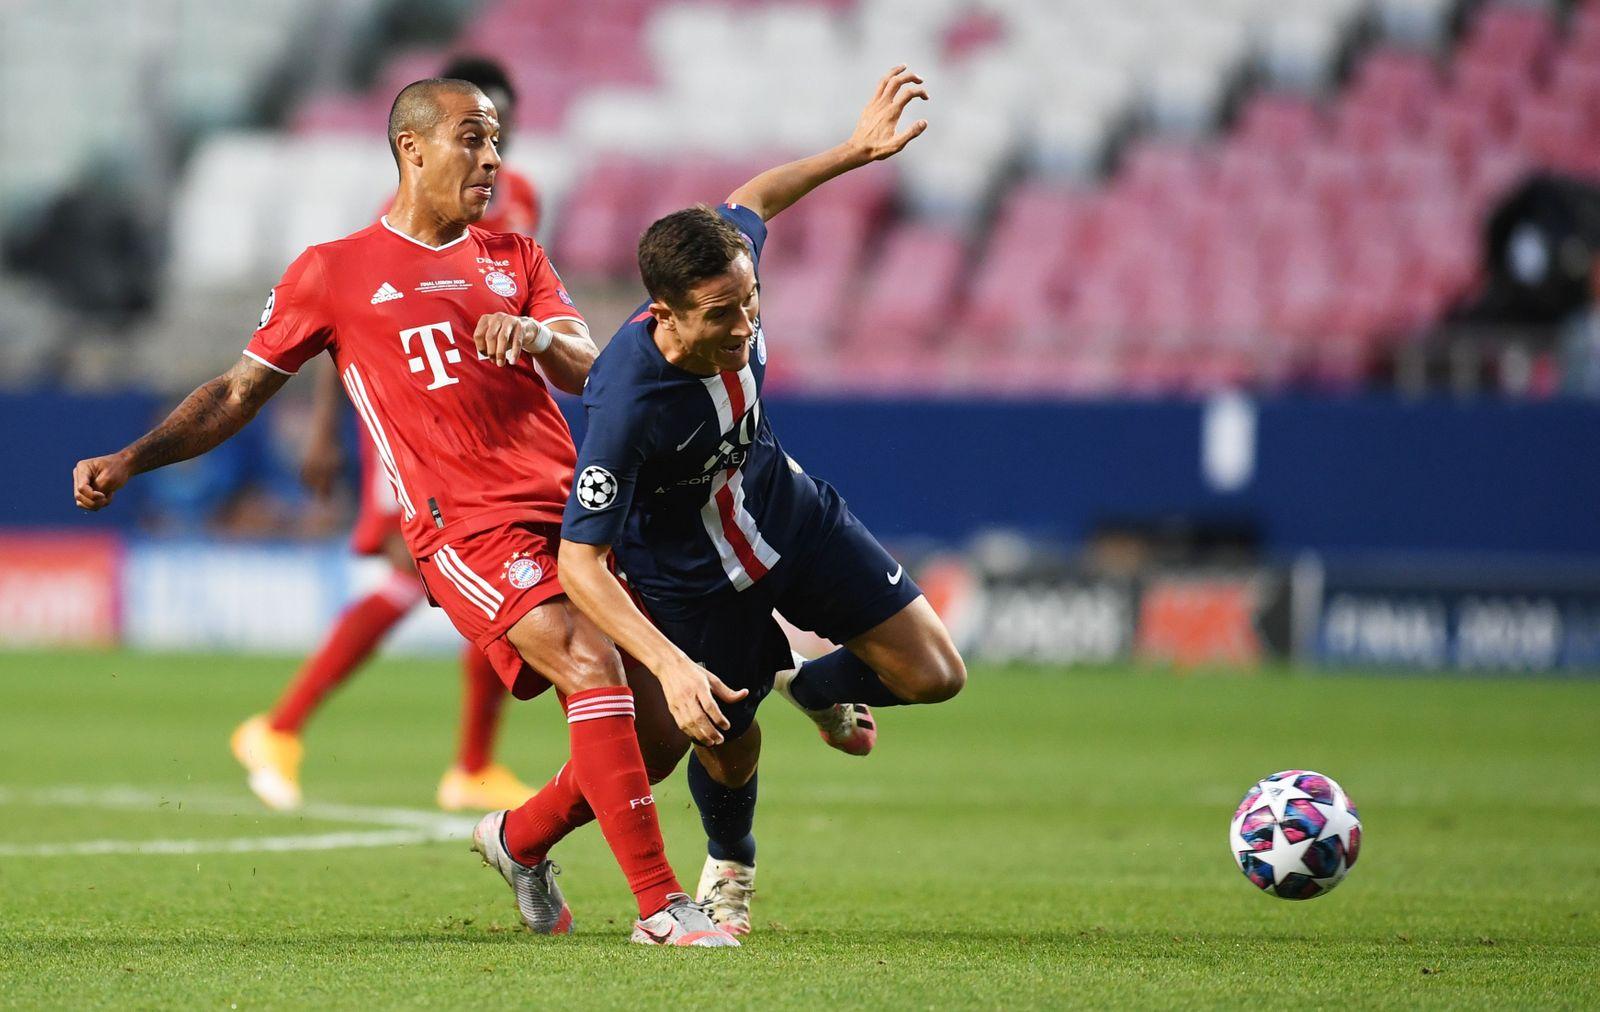 PSG vs Bayern Munich, Lisbon, Portugal - 23 Aug 2020